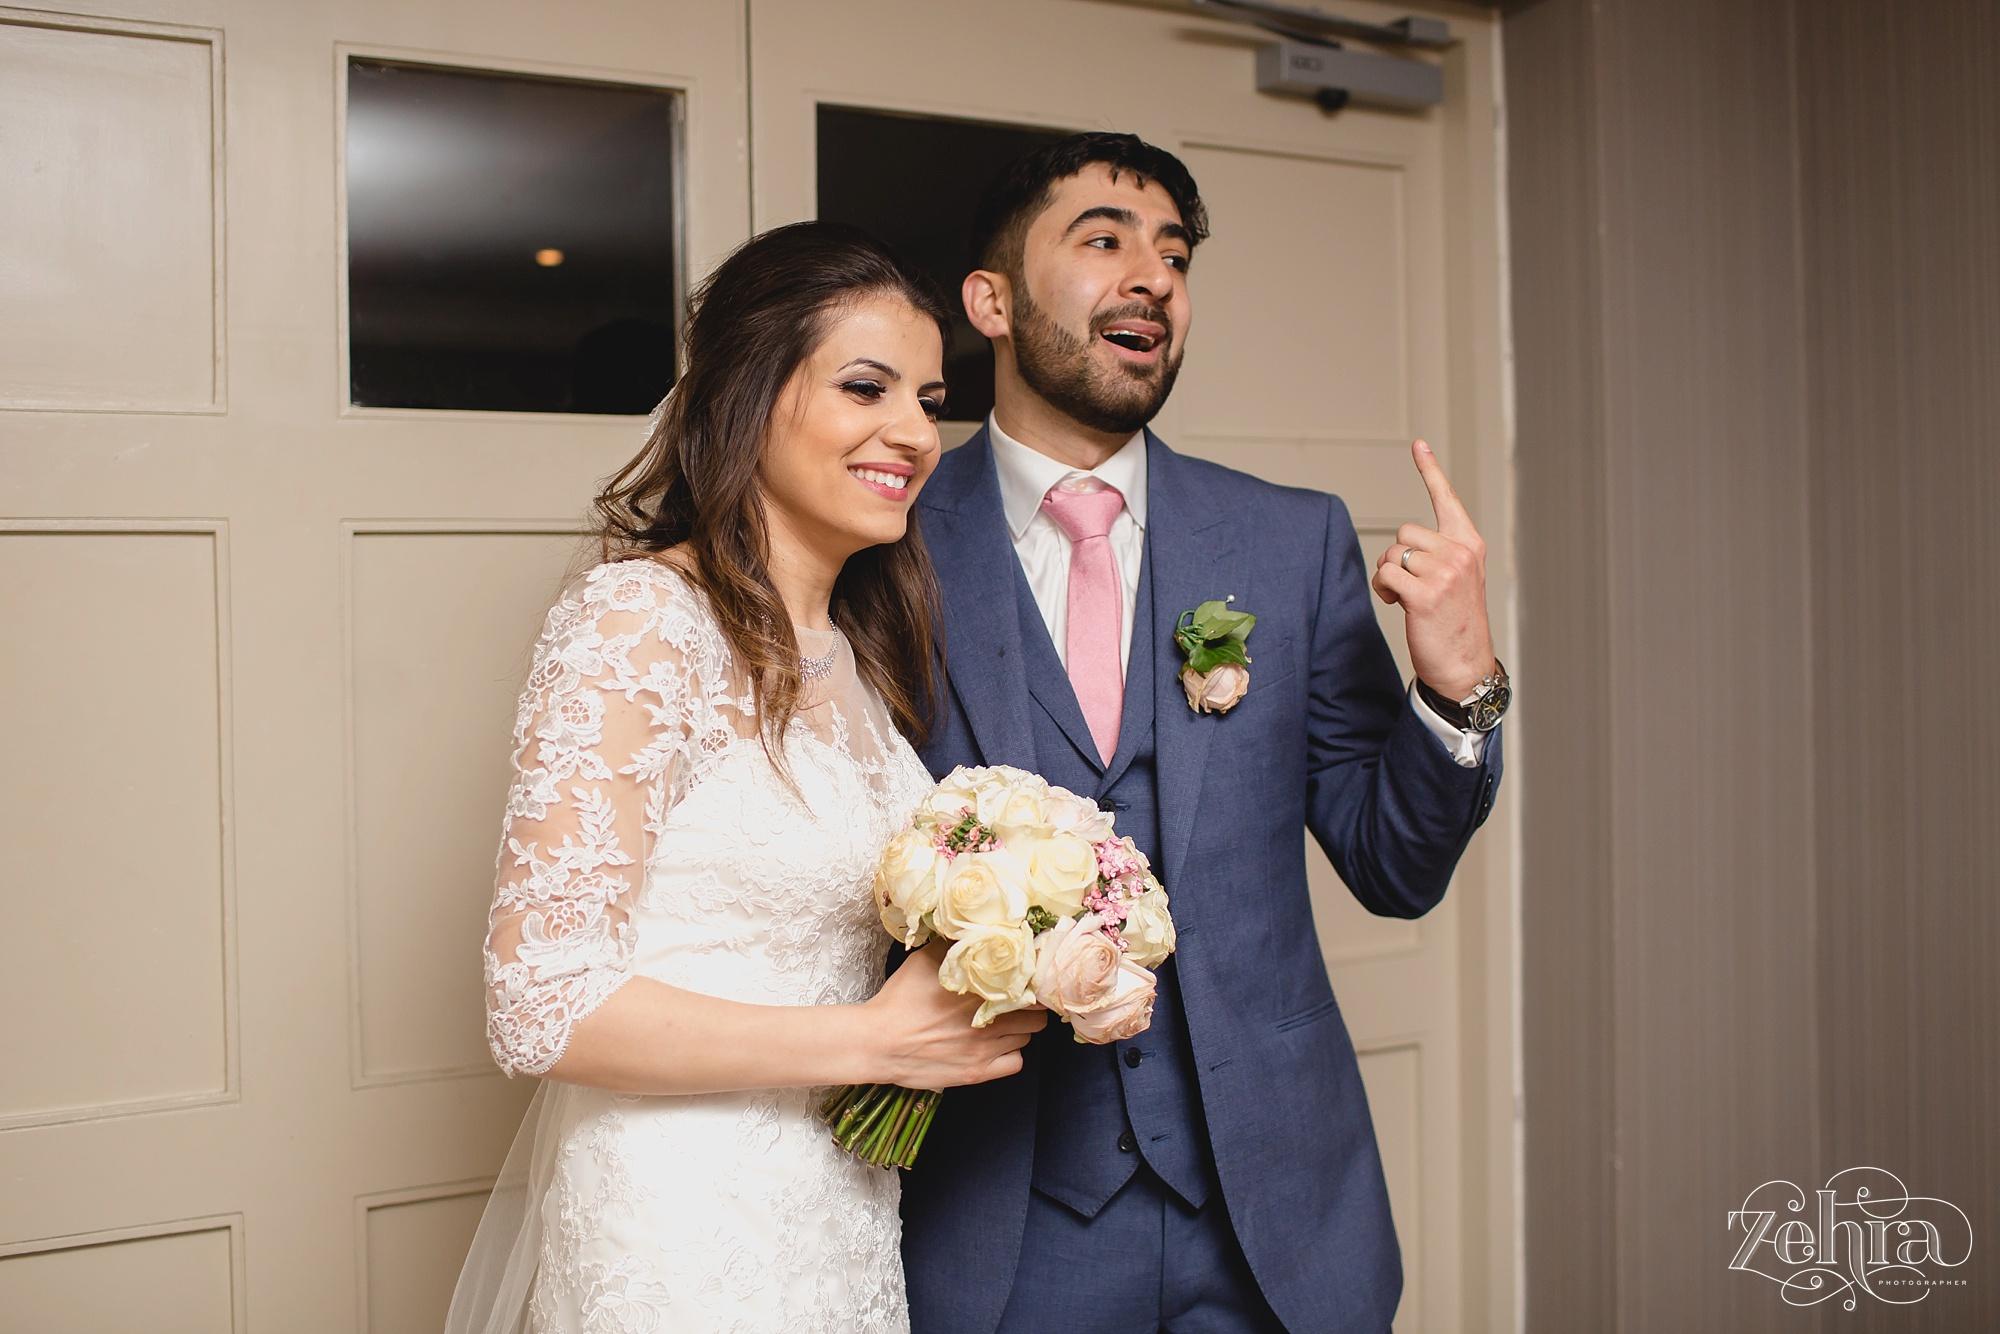 zehra photographer mere cheshire wedding_0071.jpg